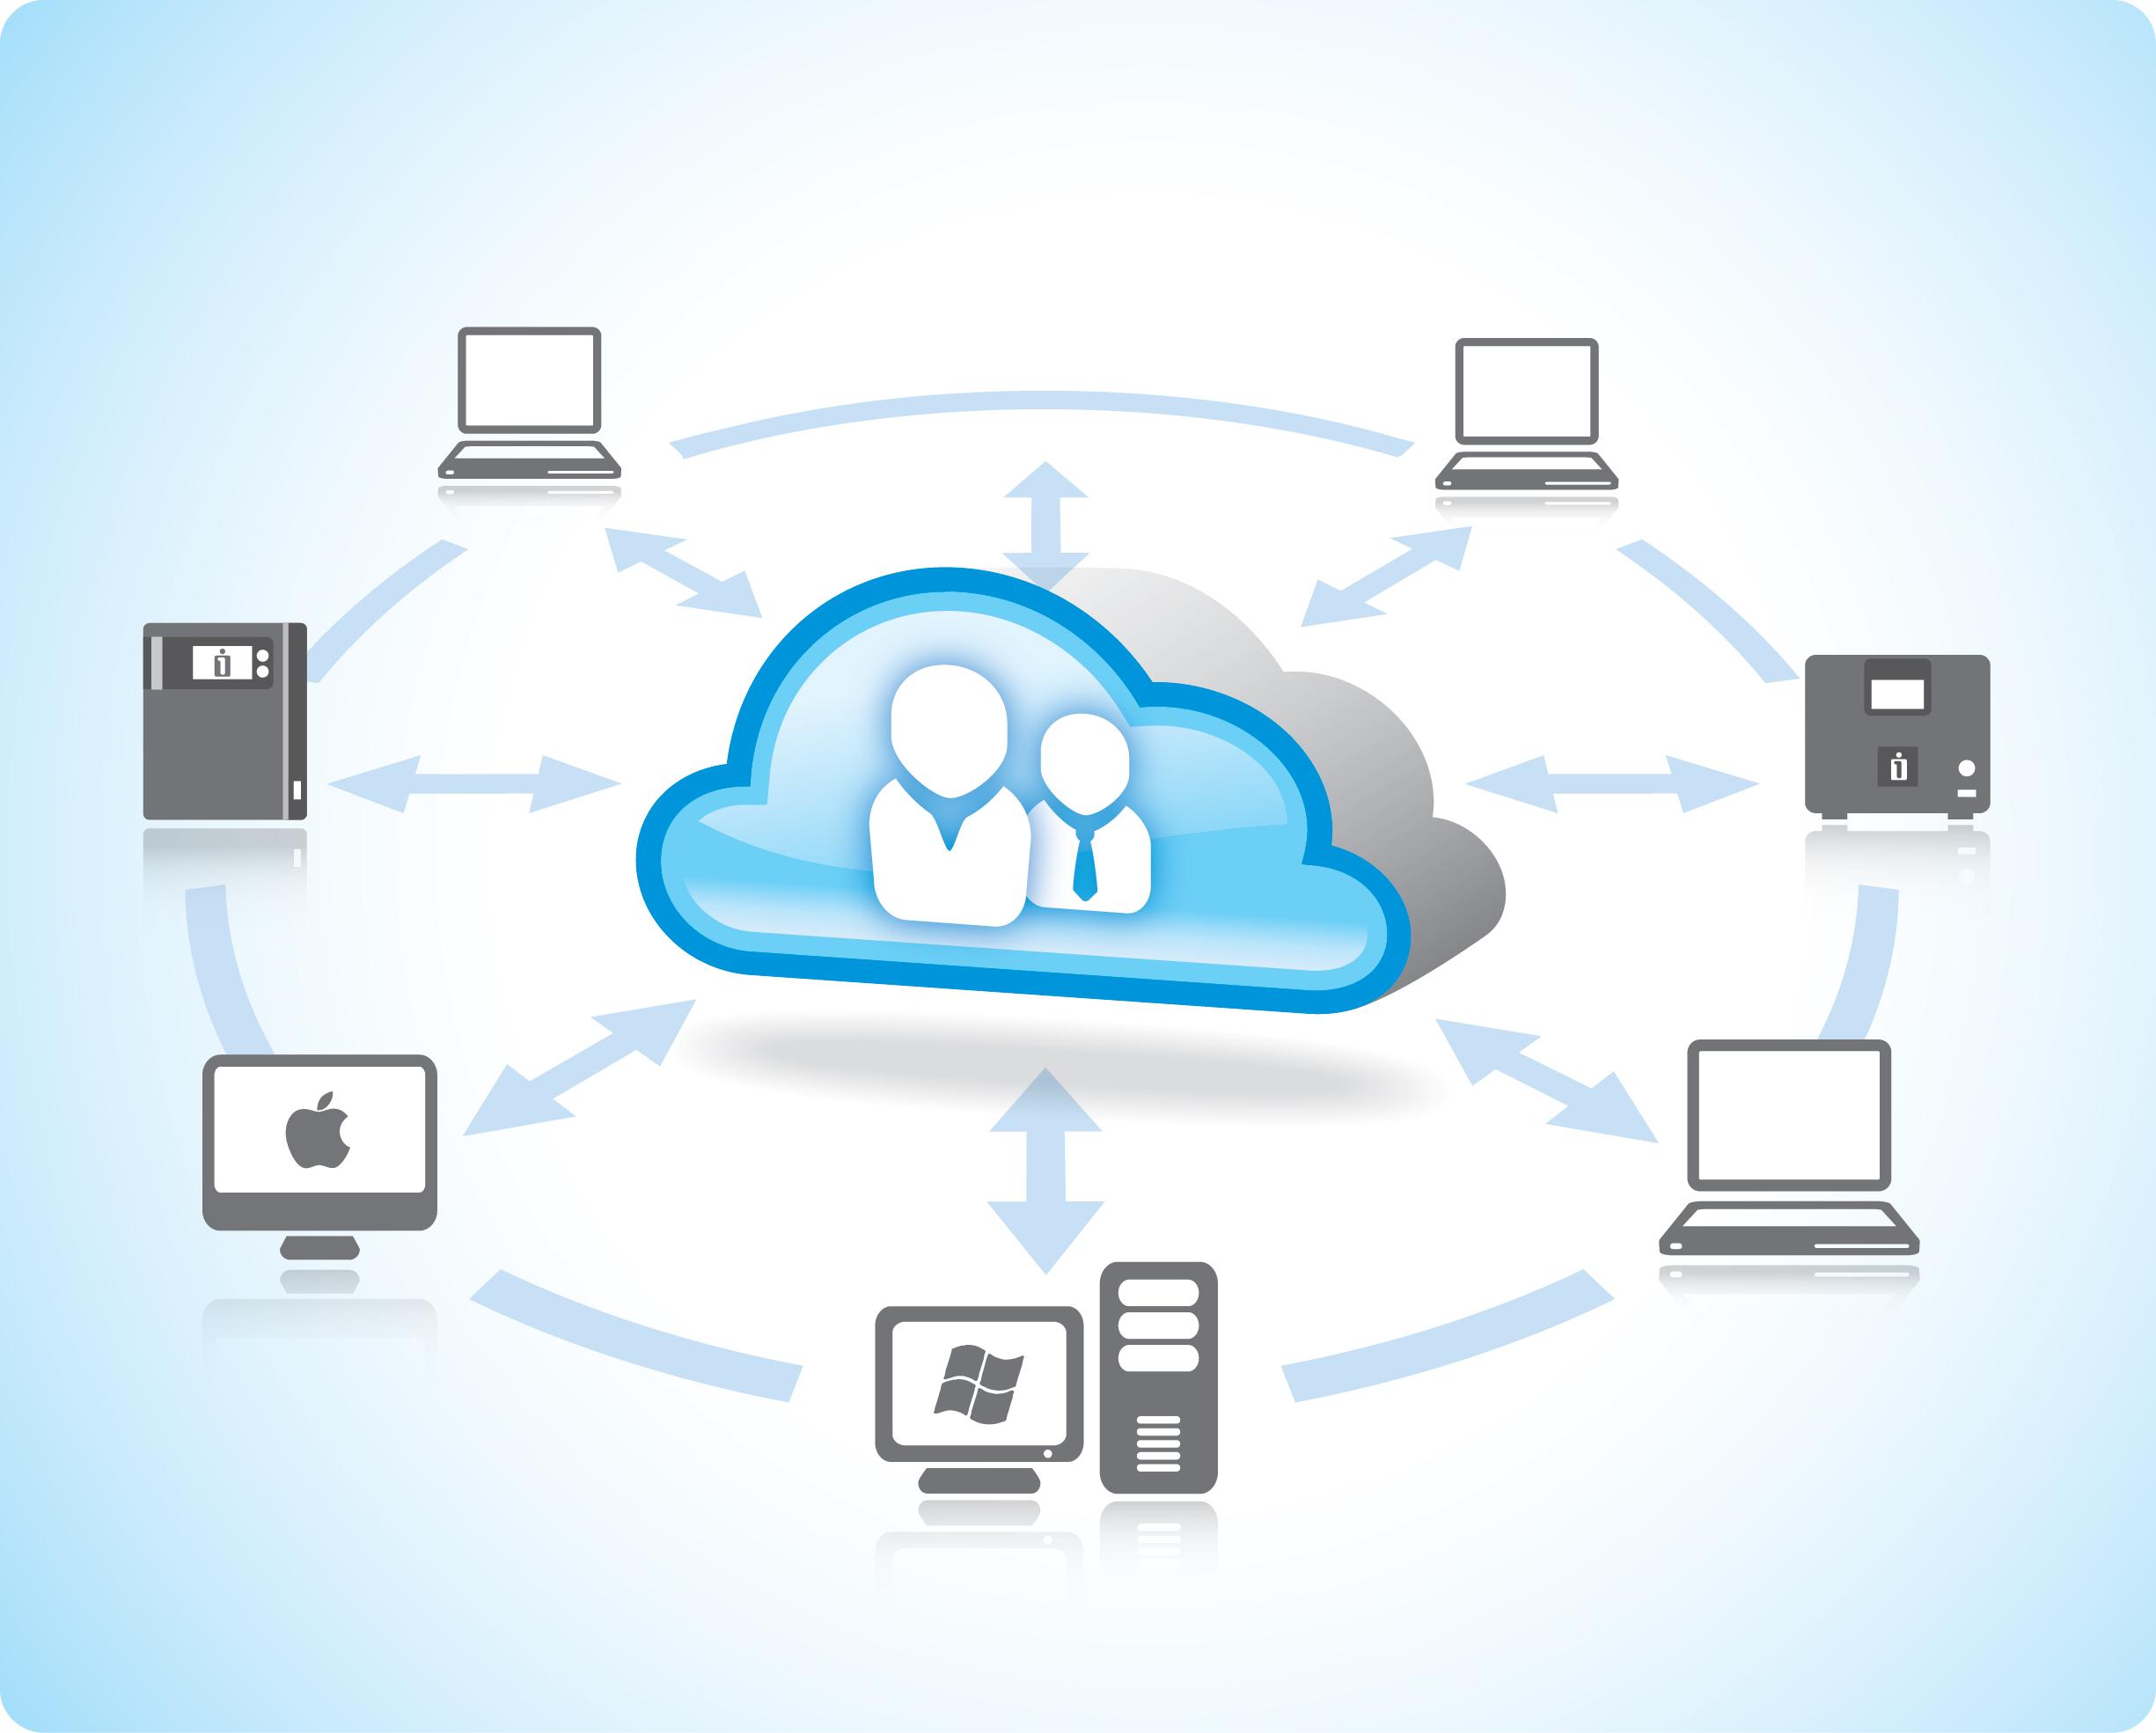 Best personal cloud storage options